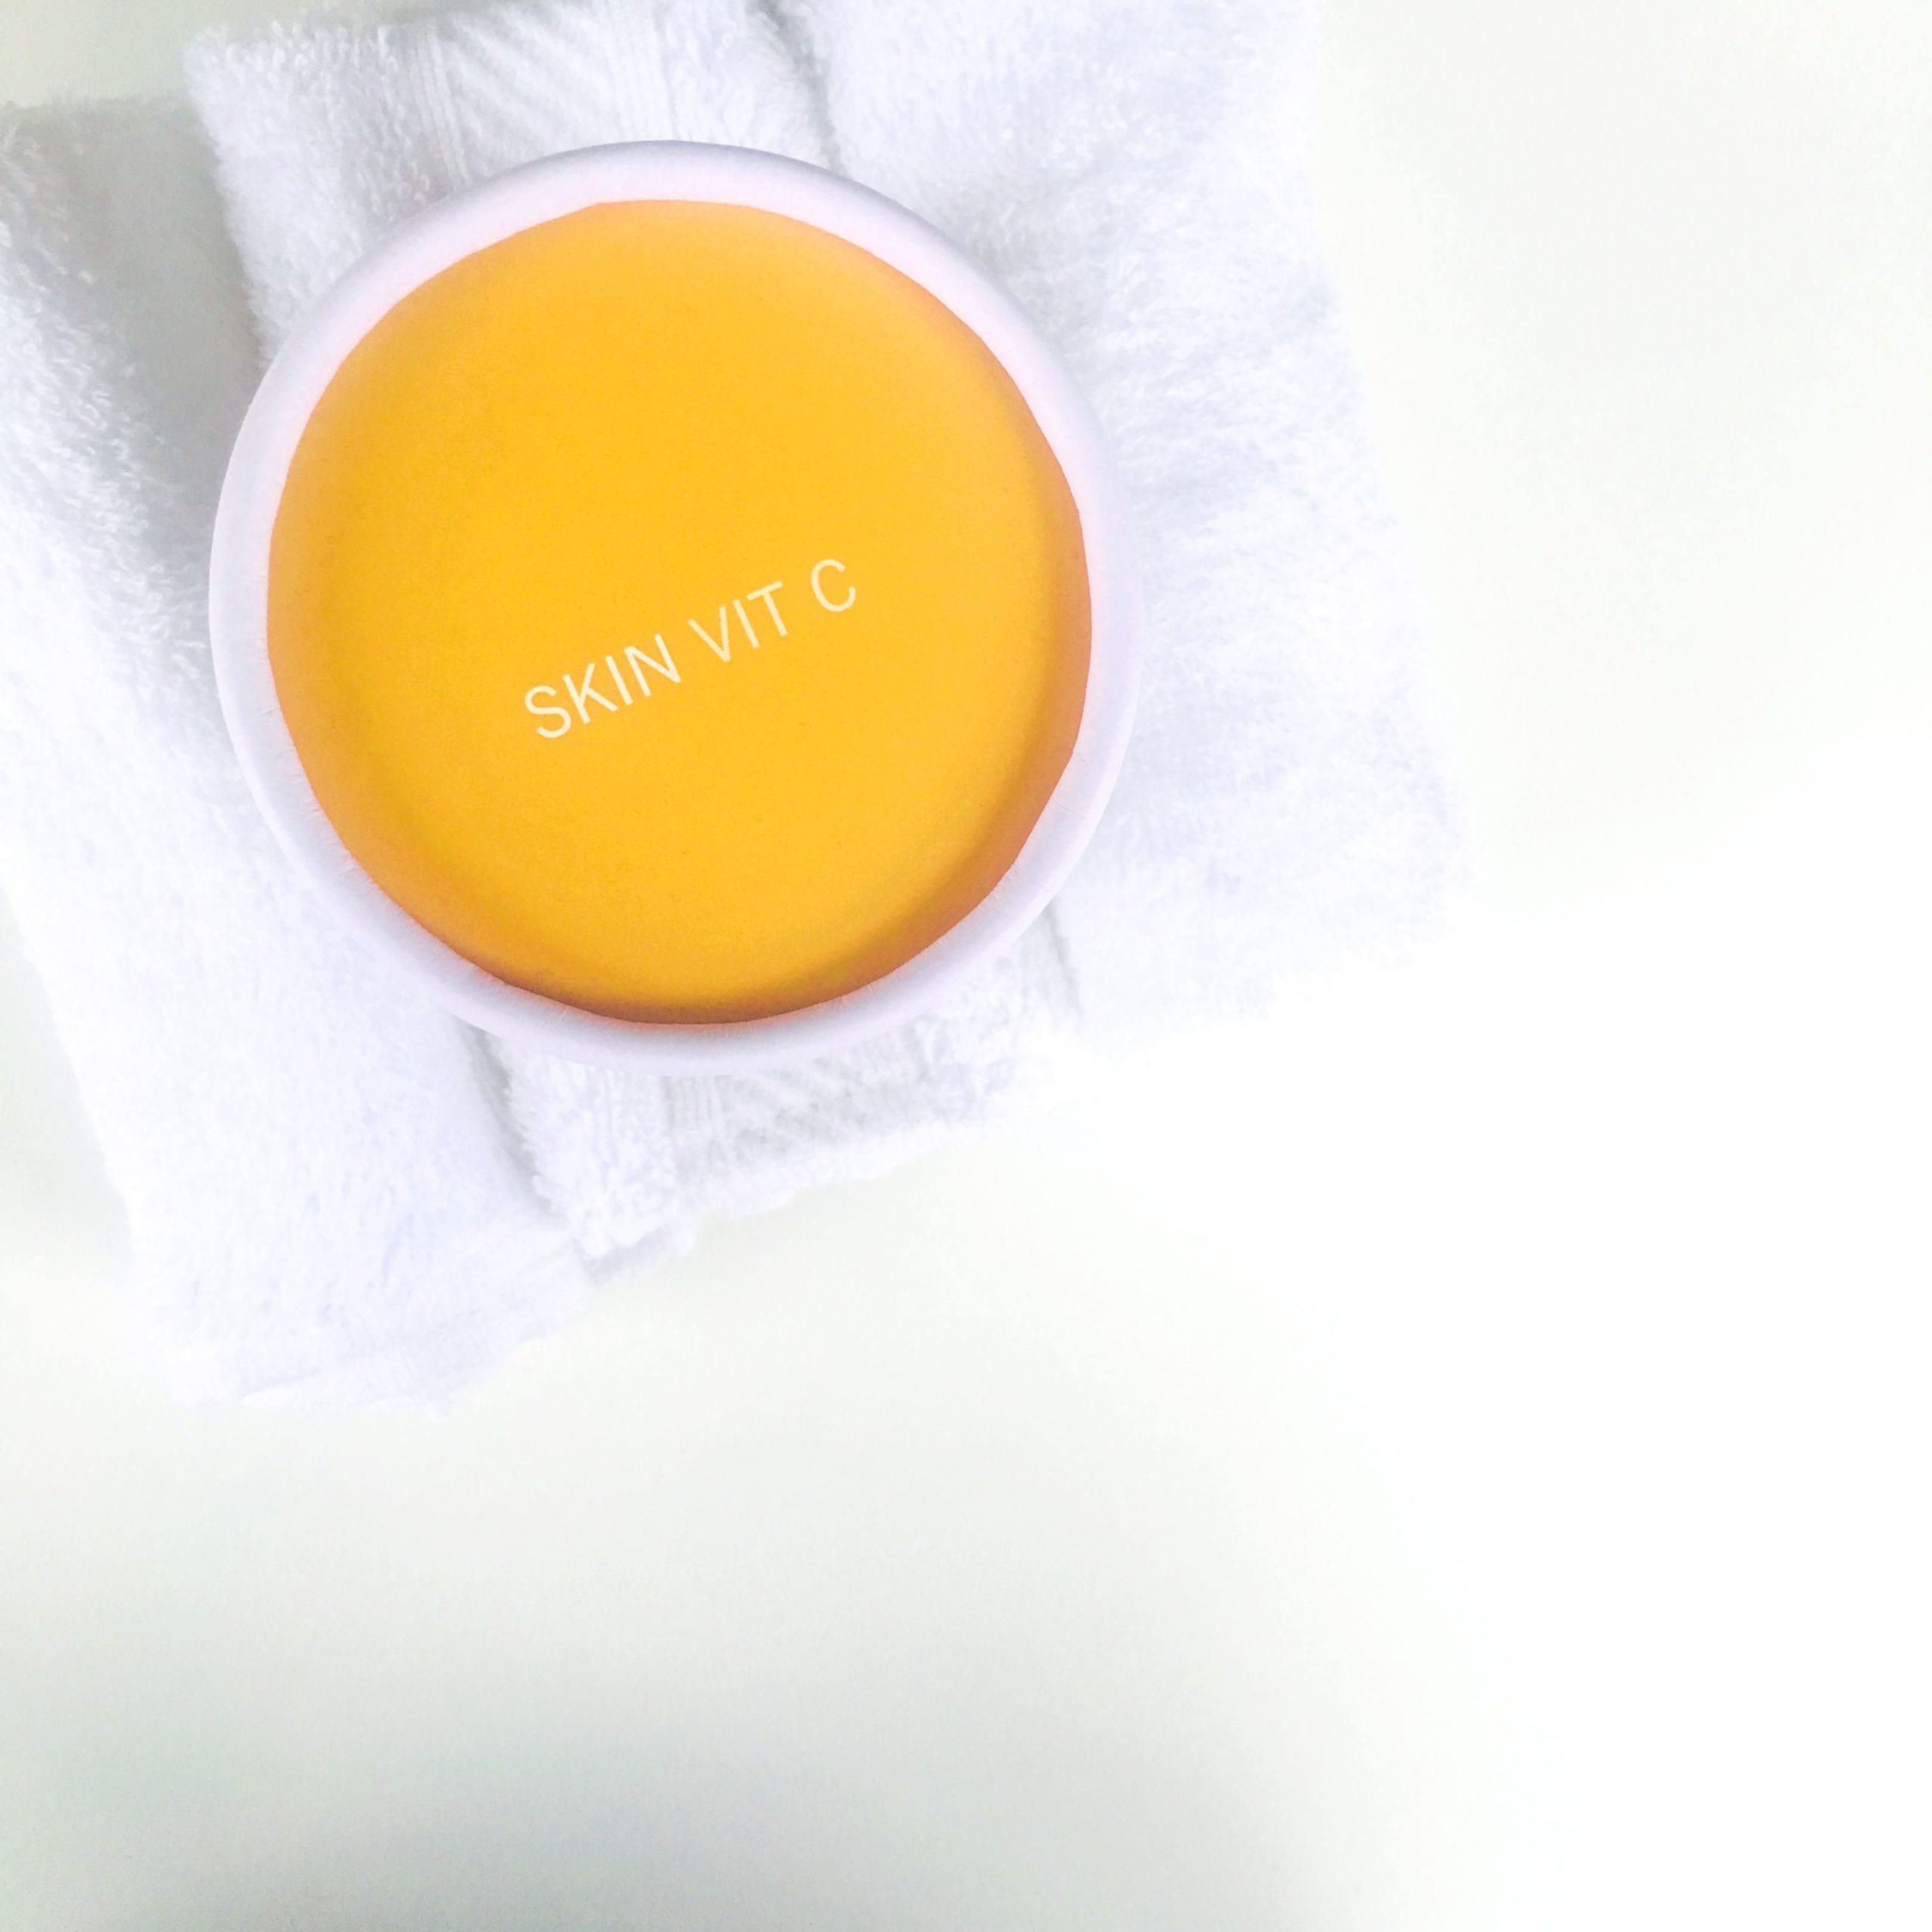 Skin Vit C (60 tablets)